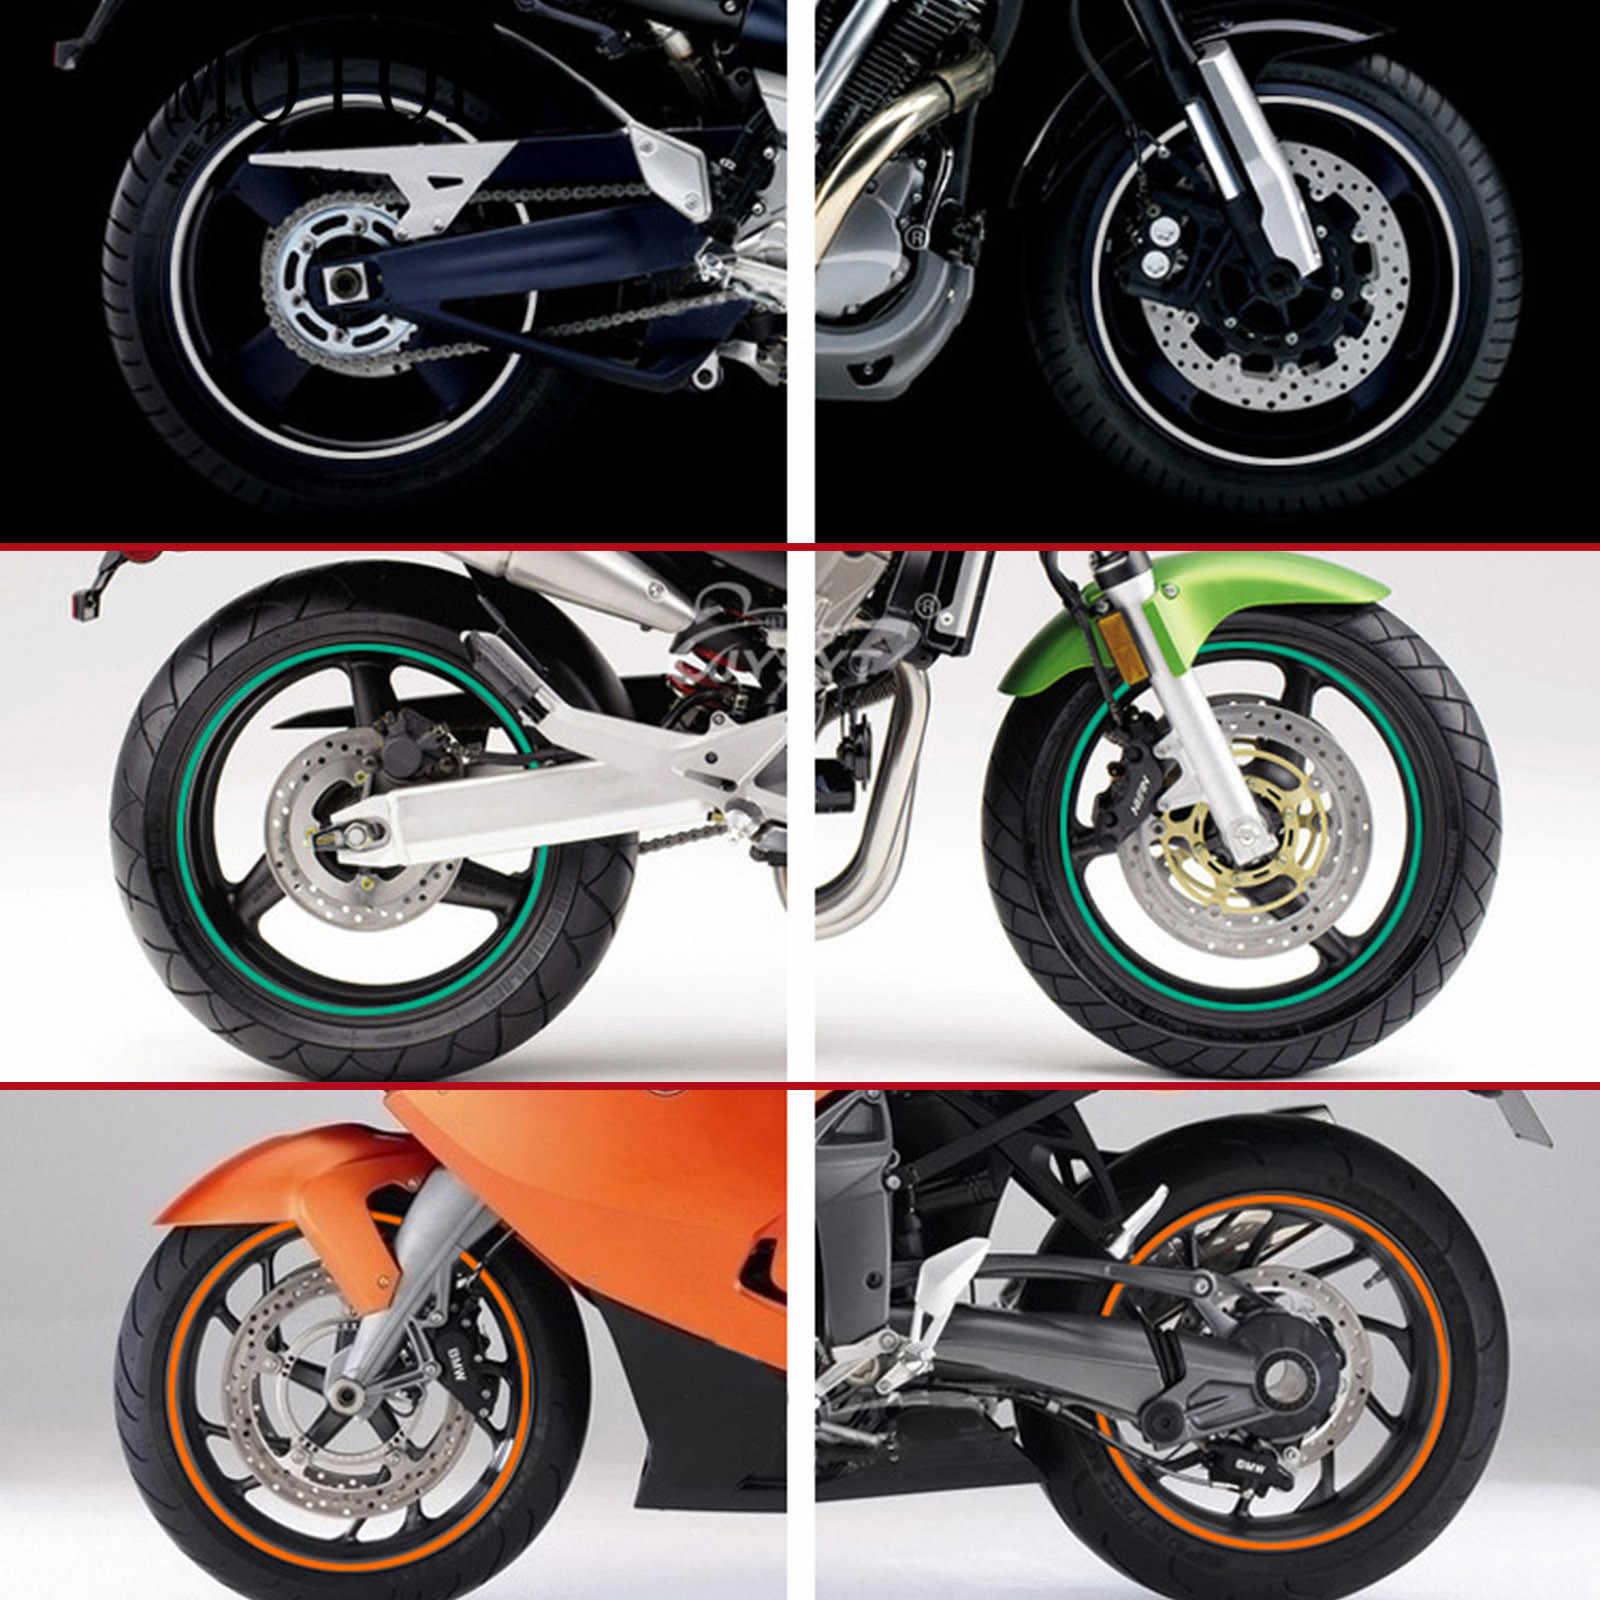 Adhesivo para rueda de motocicleta, pegatinas reflectantes para Motocross, tira de cinta para llanta para Yamaha FZ8 TDM 900 MT125 YZF R15 XT660 TMAX 500 530